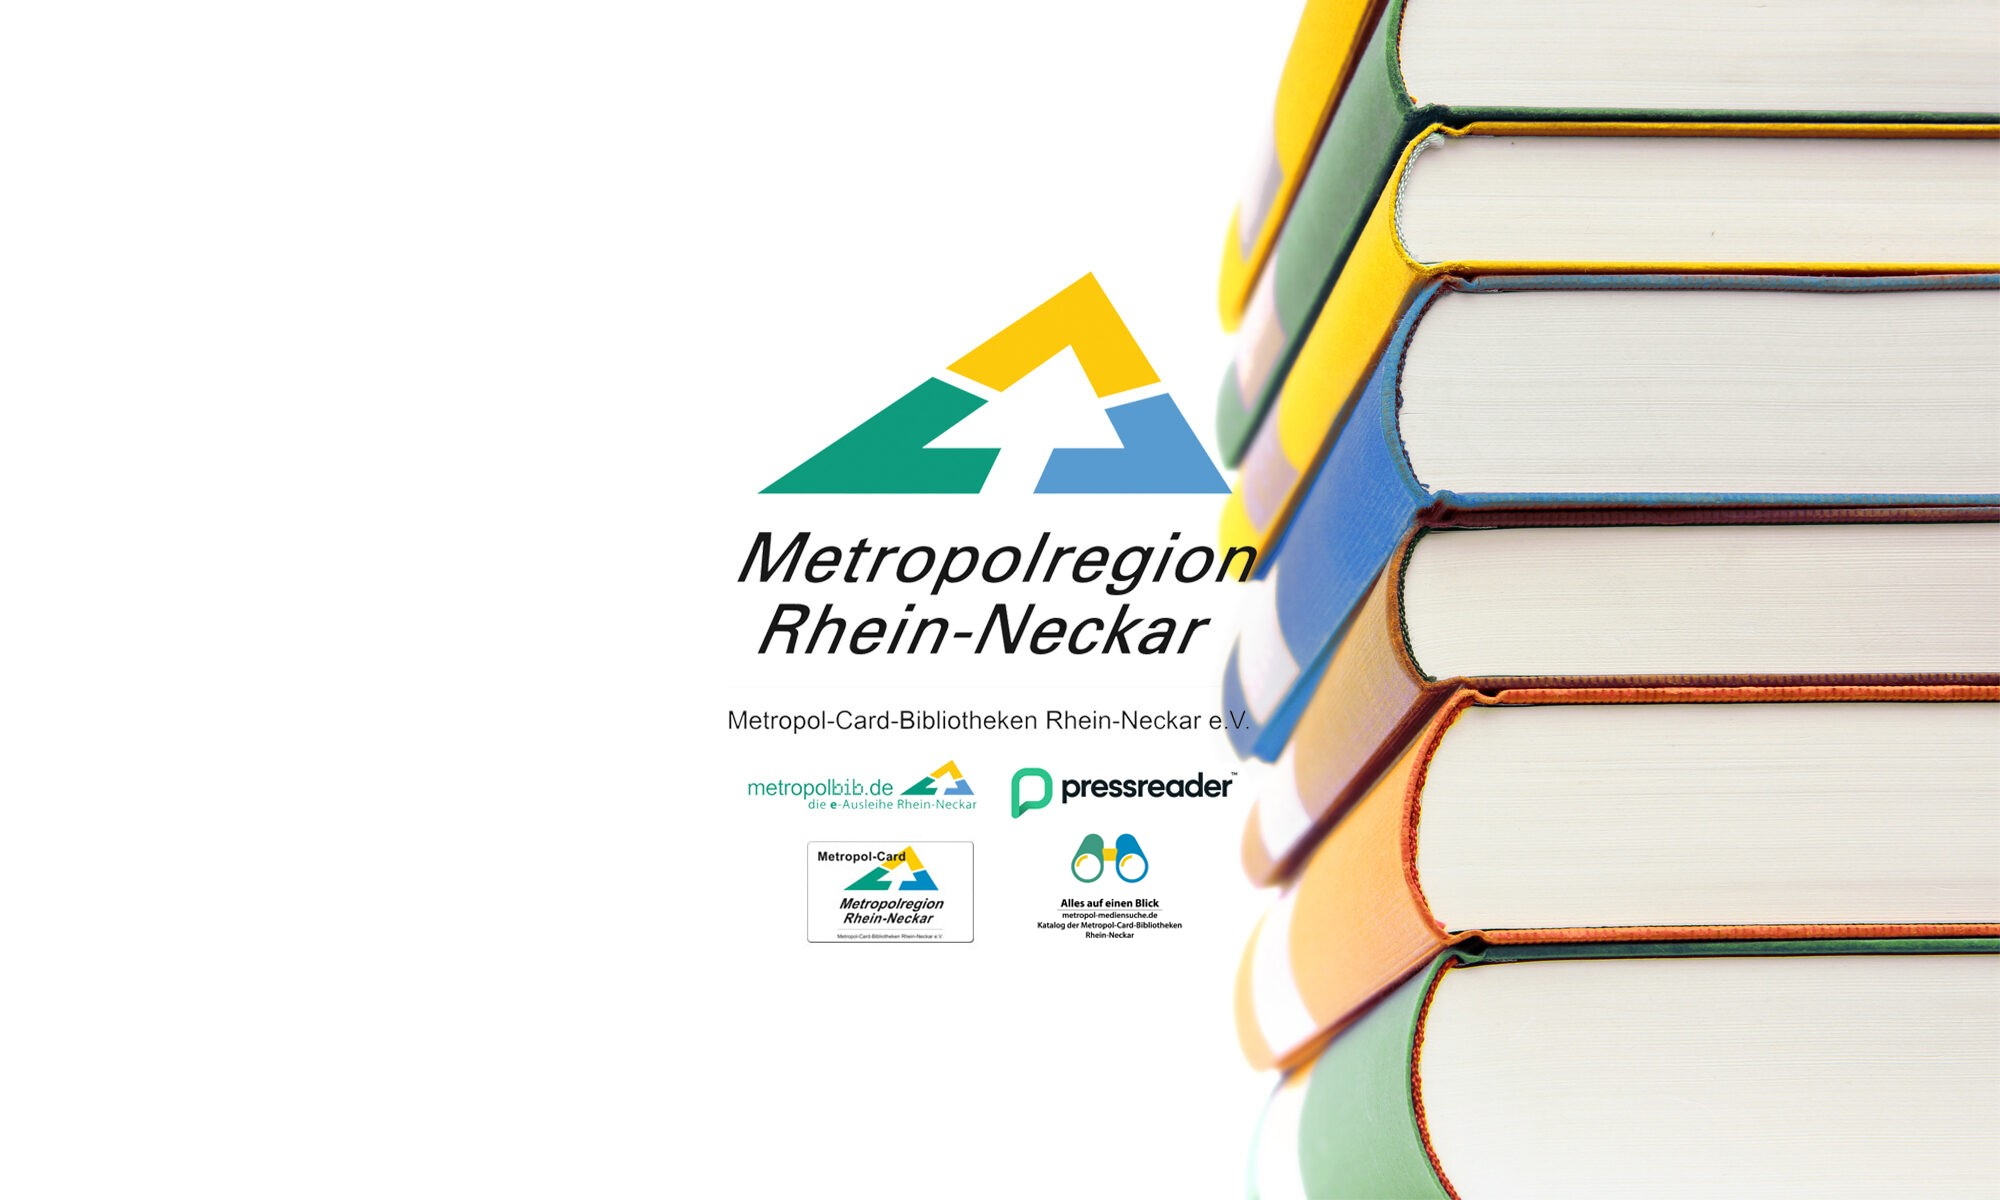 metropol-card.net